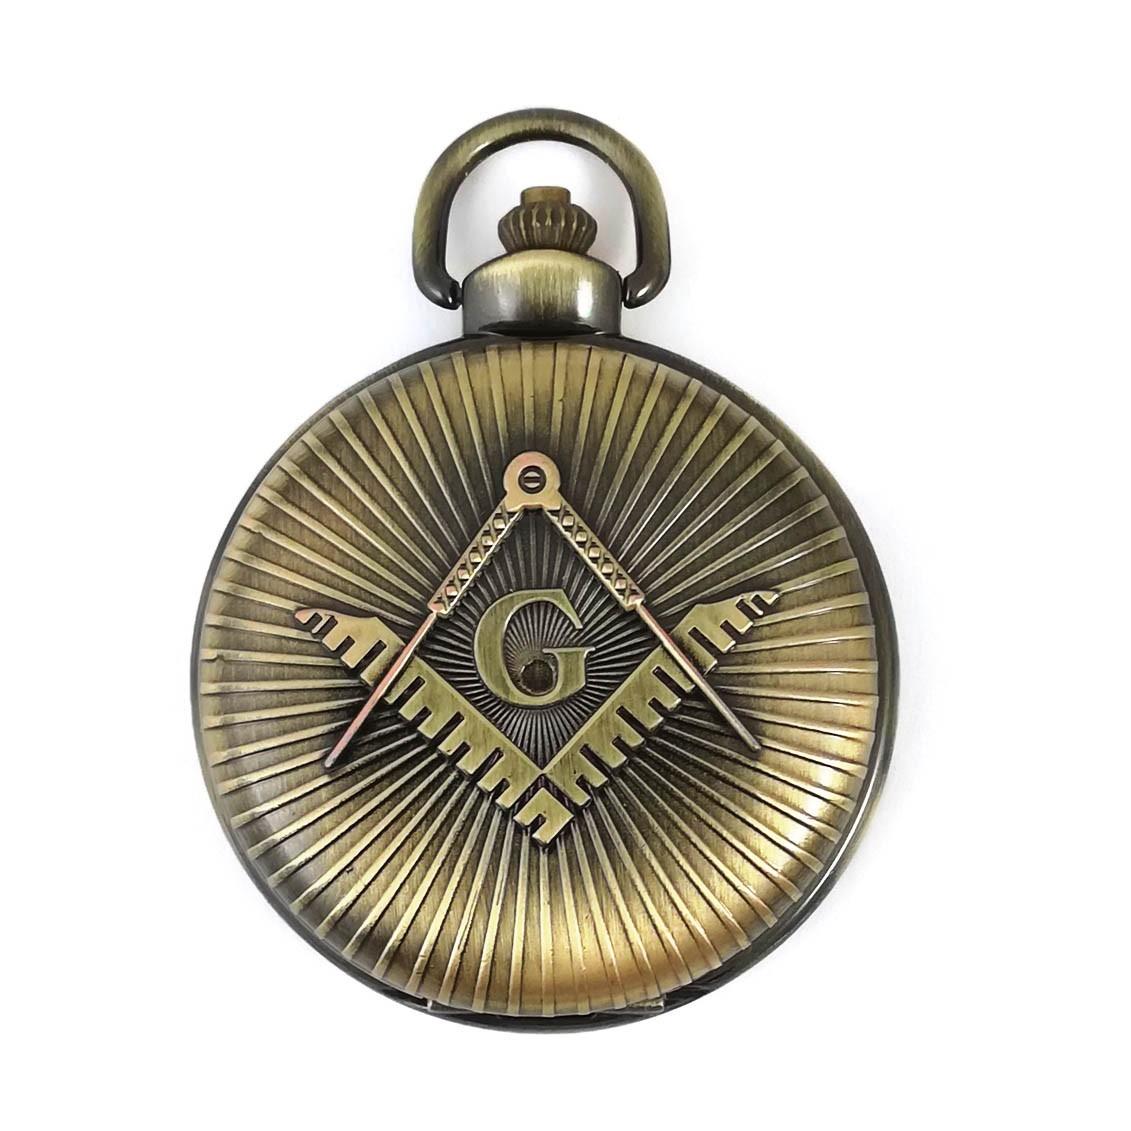 Ceas de buzunar masonic - Culoare Bronz - MM895 imagine techstar.ro 2021